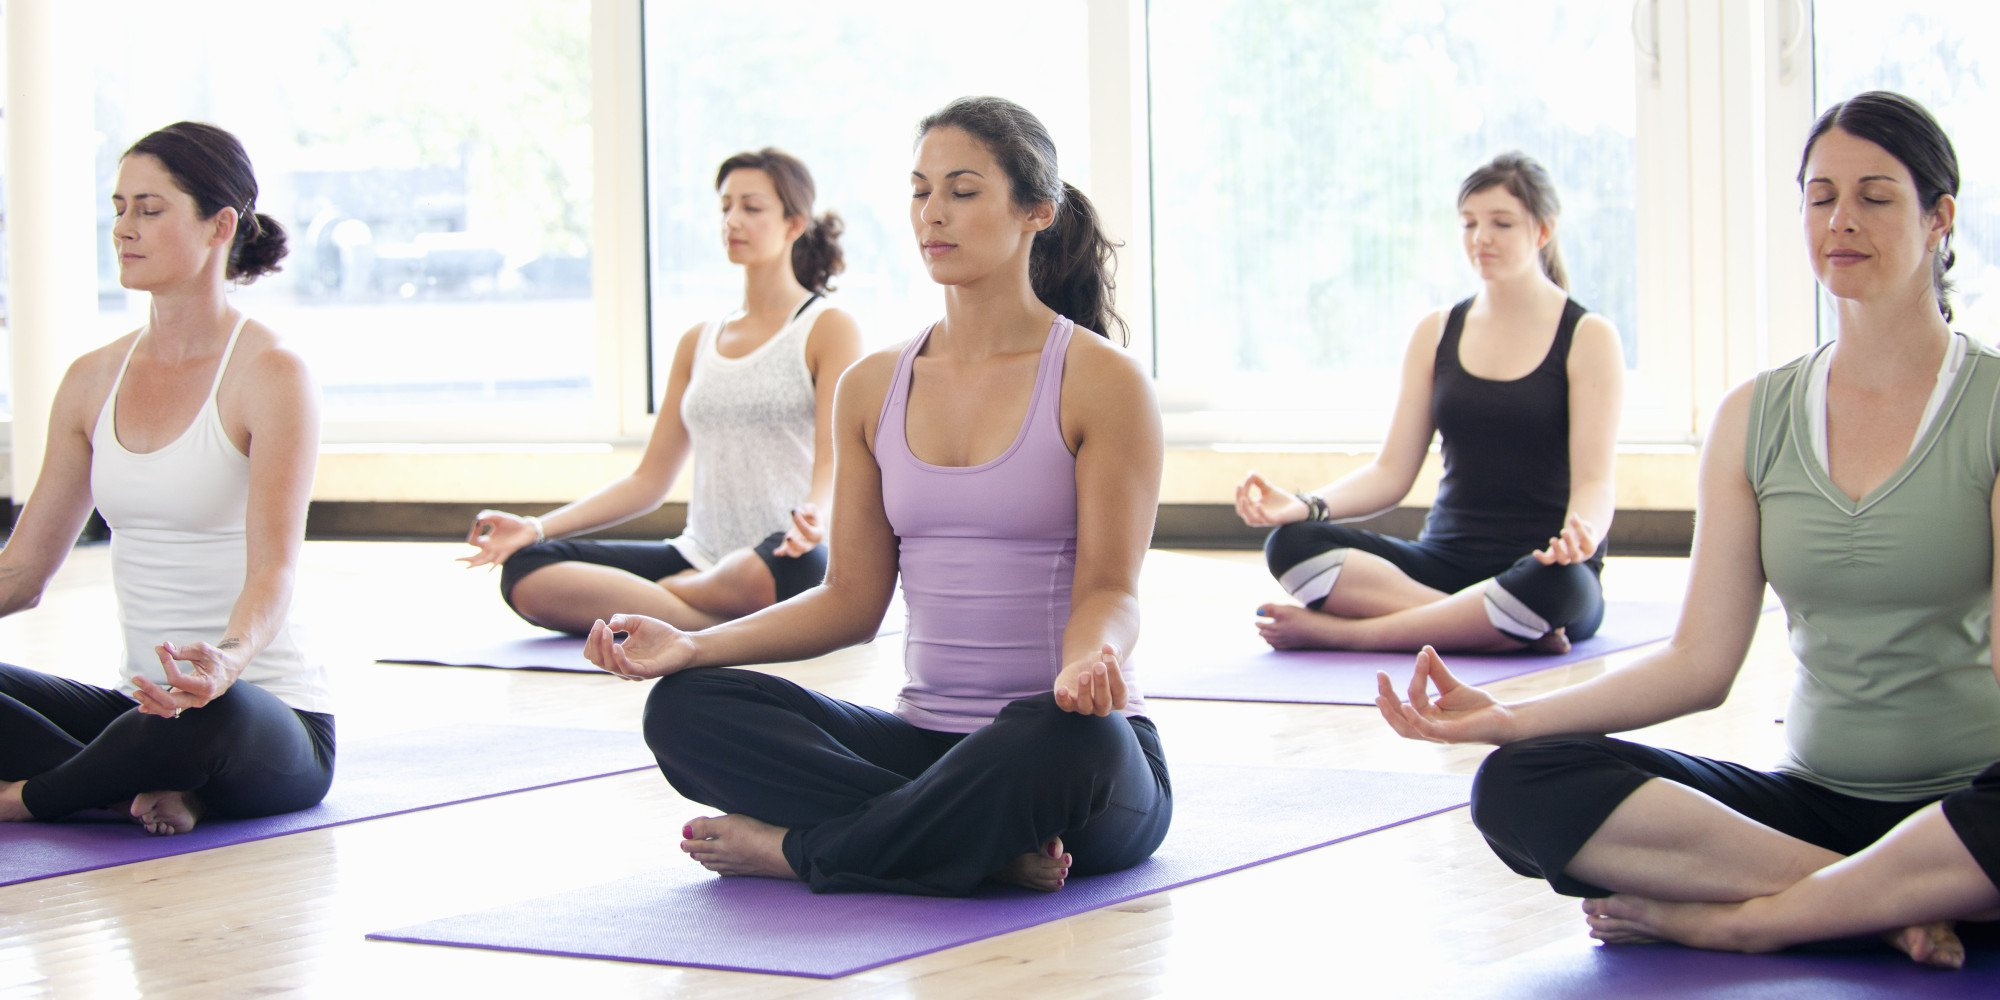 Tarot yoga-en-grupo Los códigos sagrados de Agesta Tarot